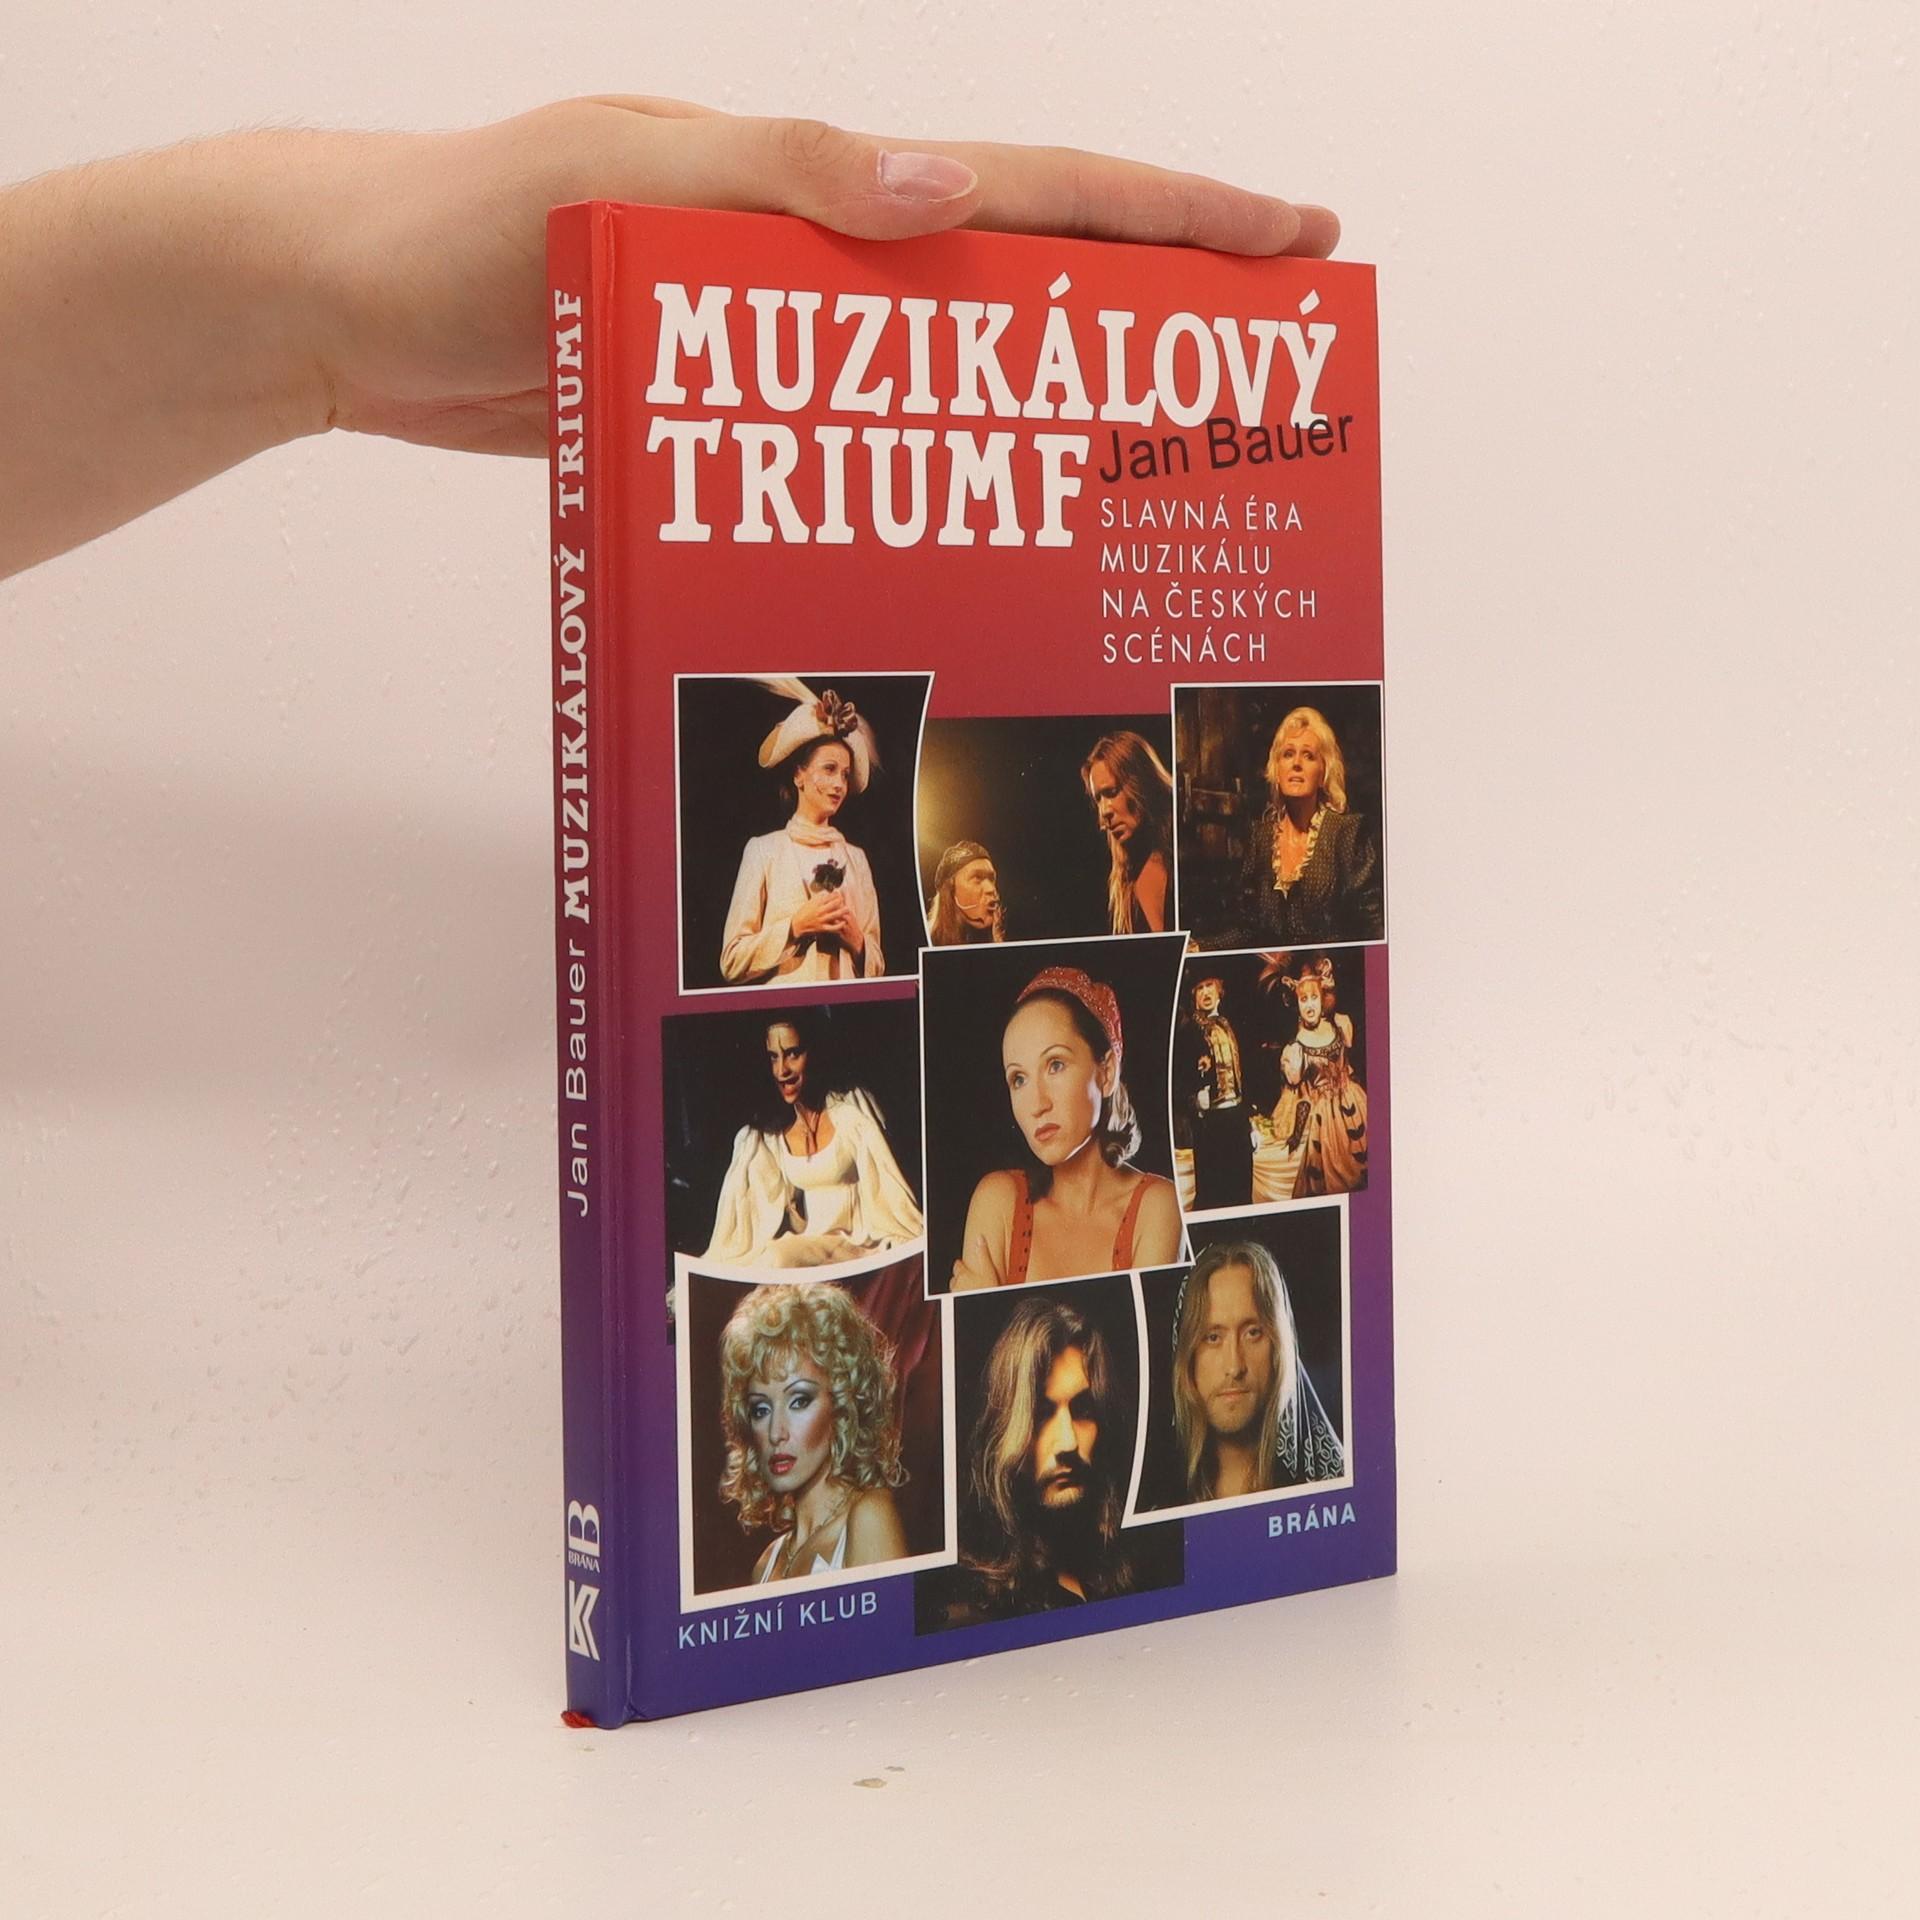 antikvární kniha Muzikálový triumf slavná éra muzikálu na českých scénách, 1999